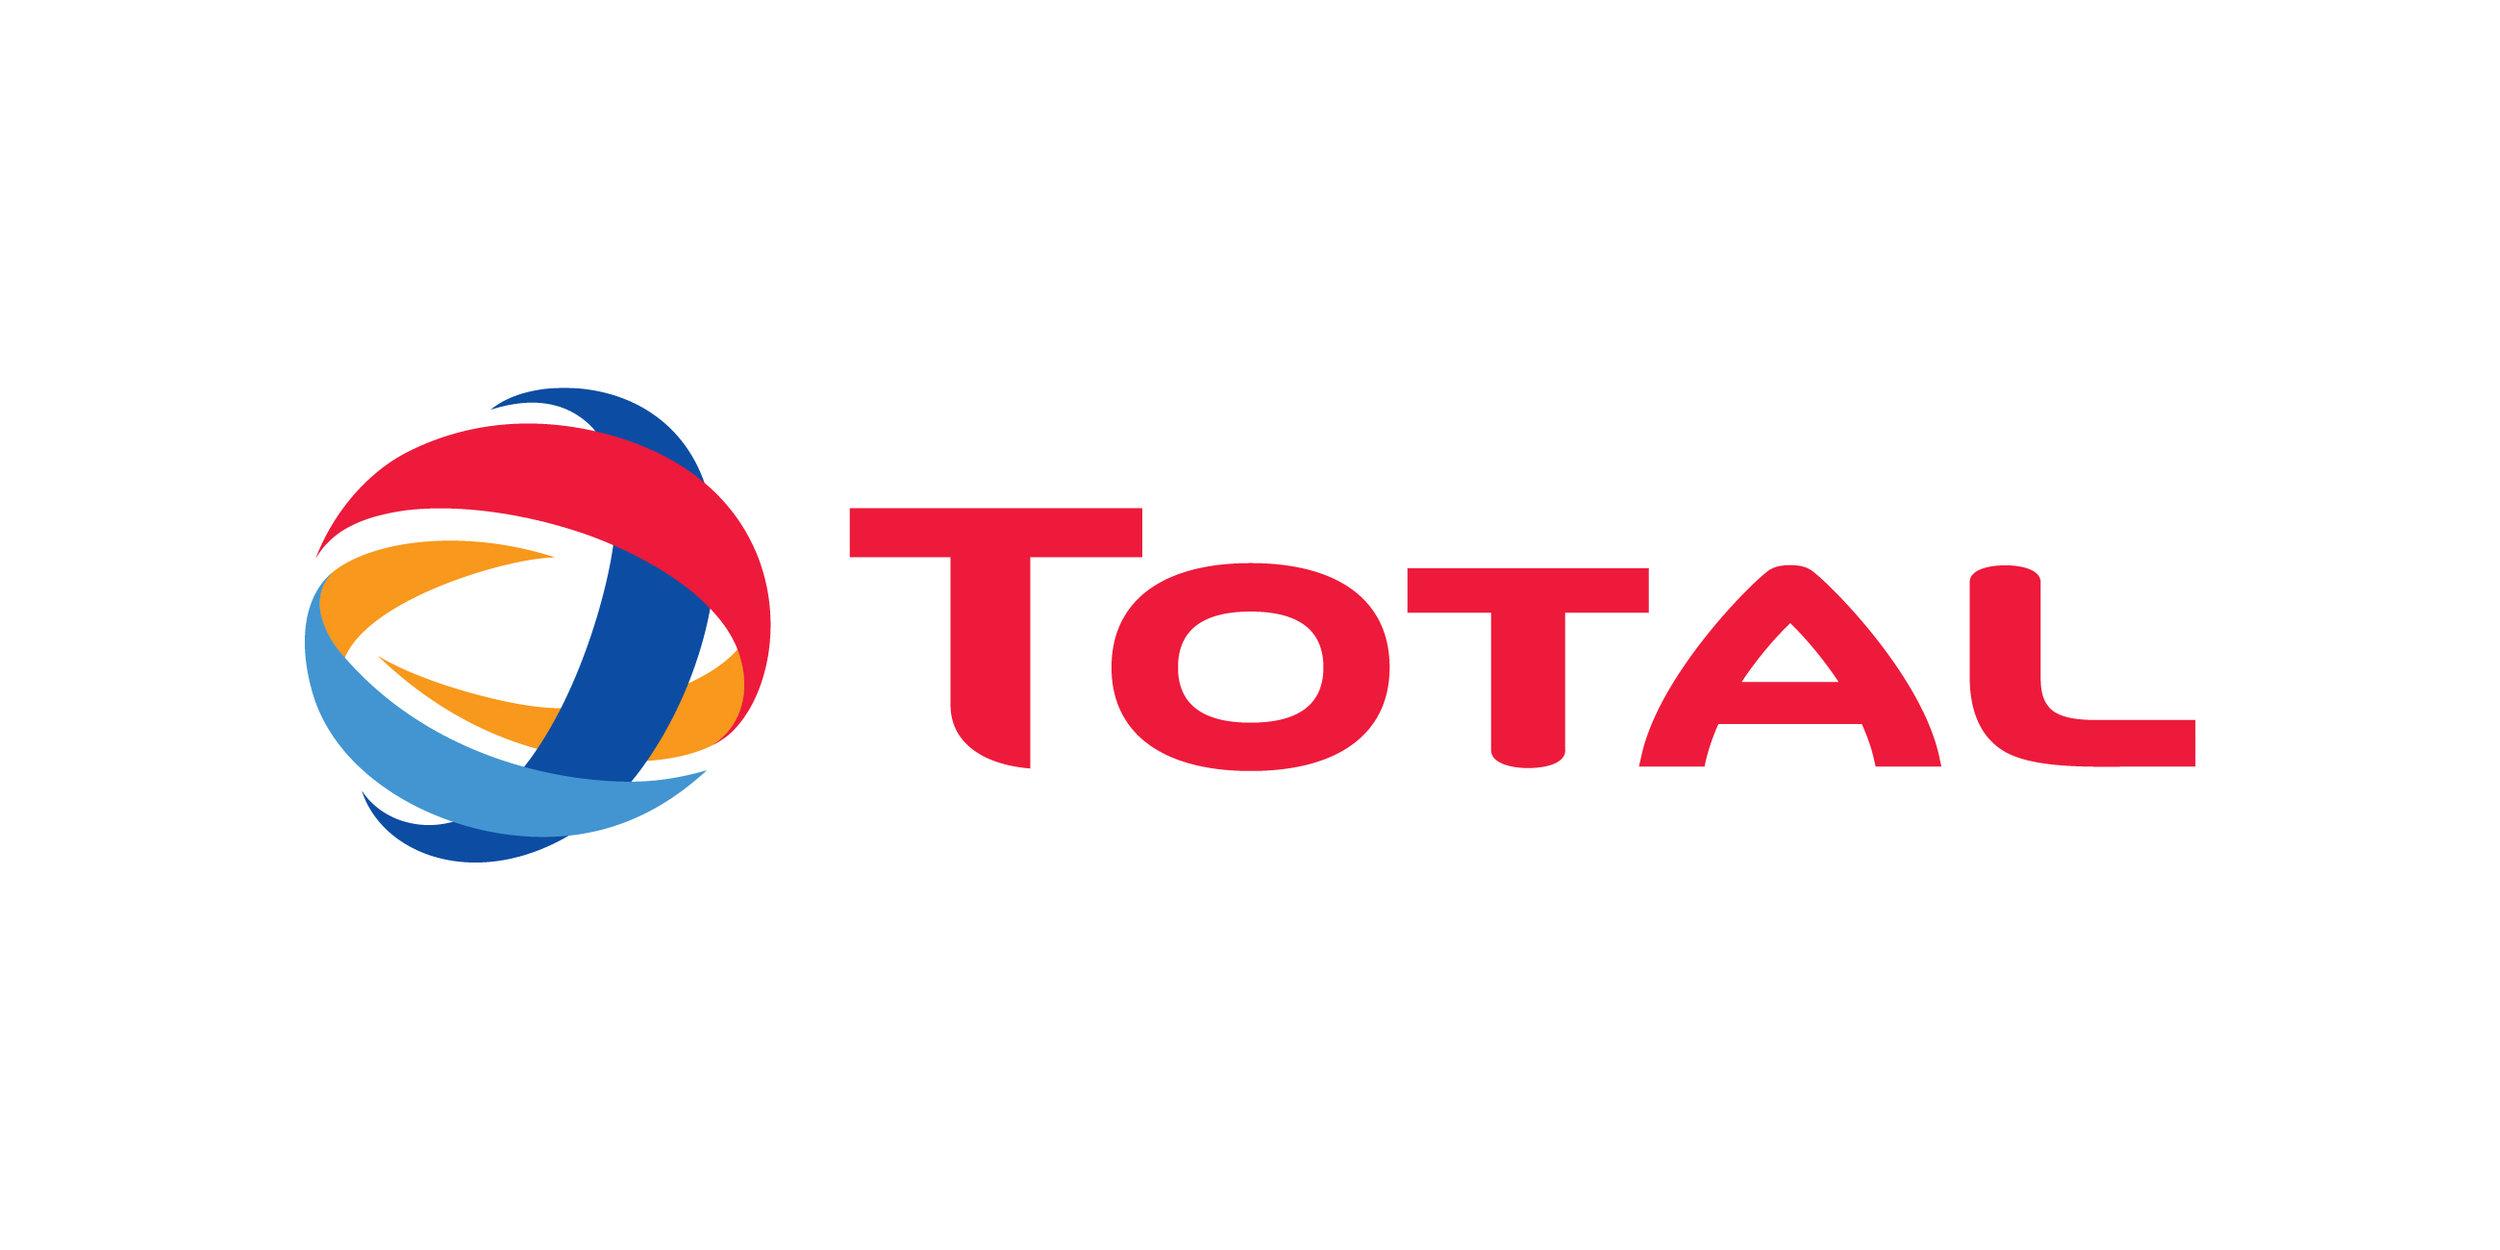 Logos 02-01.jpg